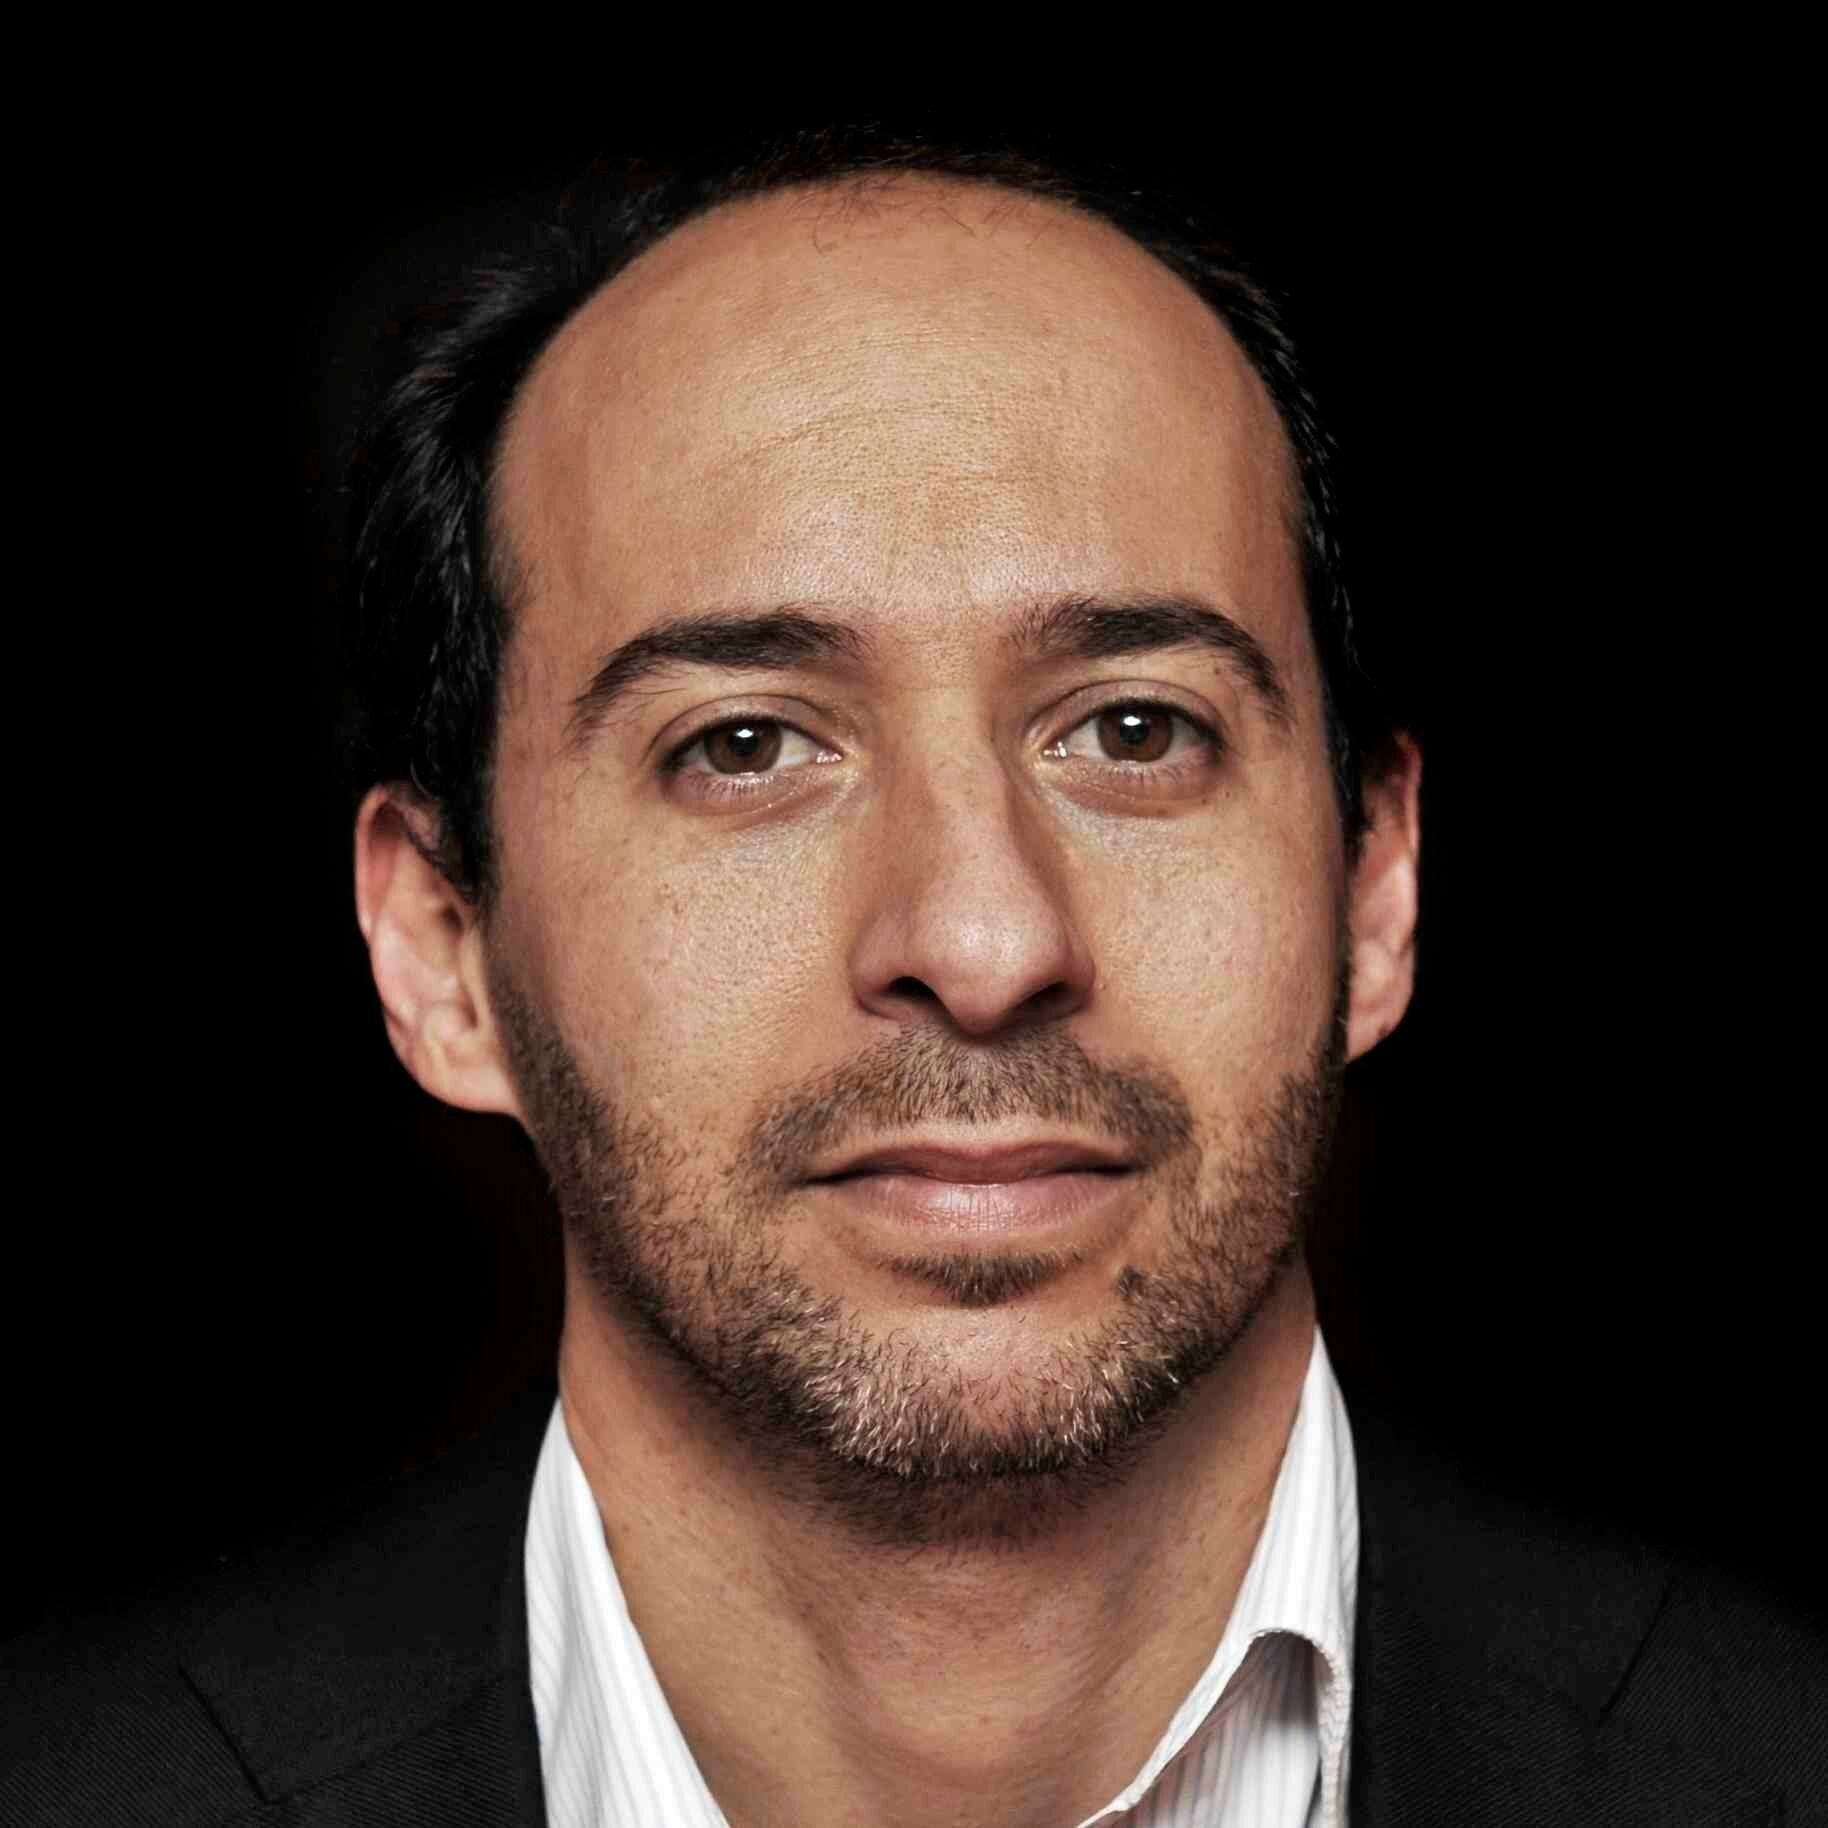 Filipe Vasconcellos